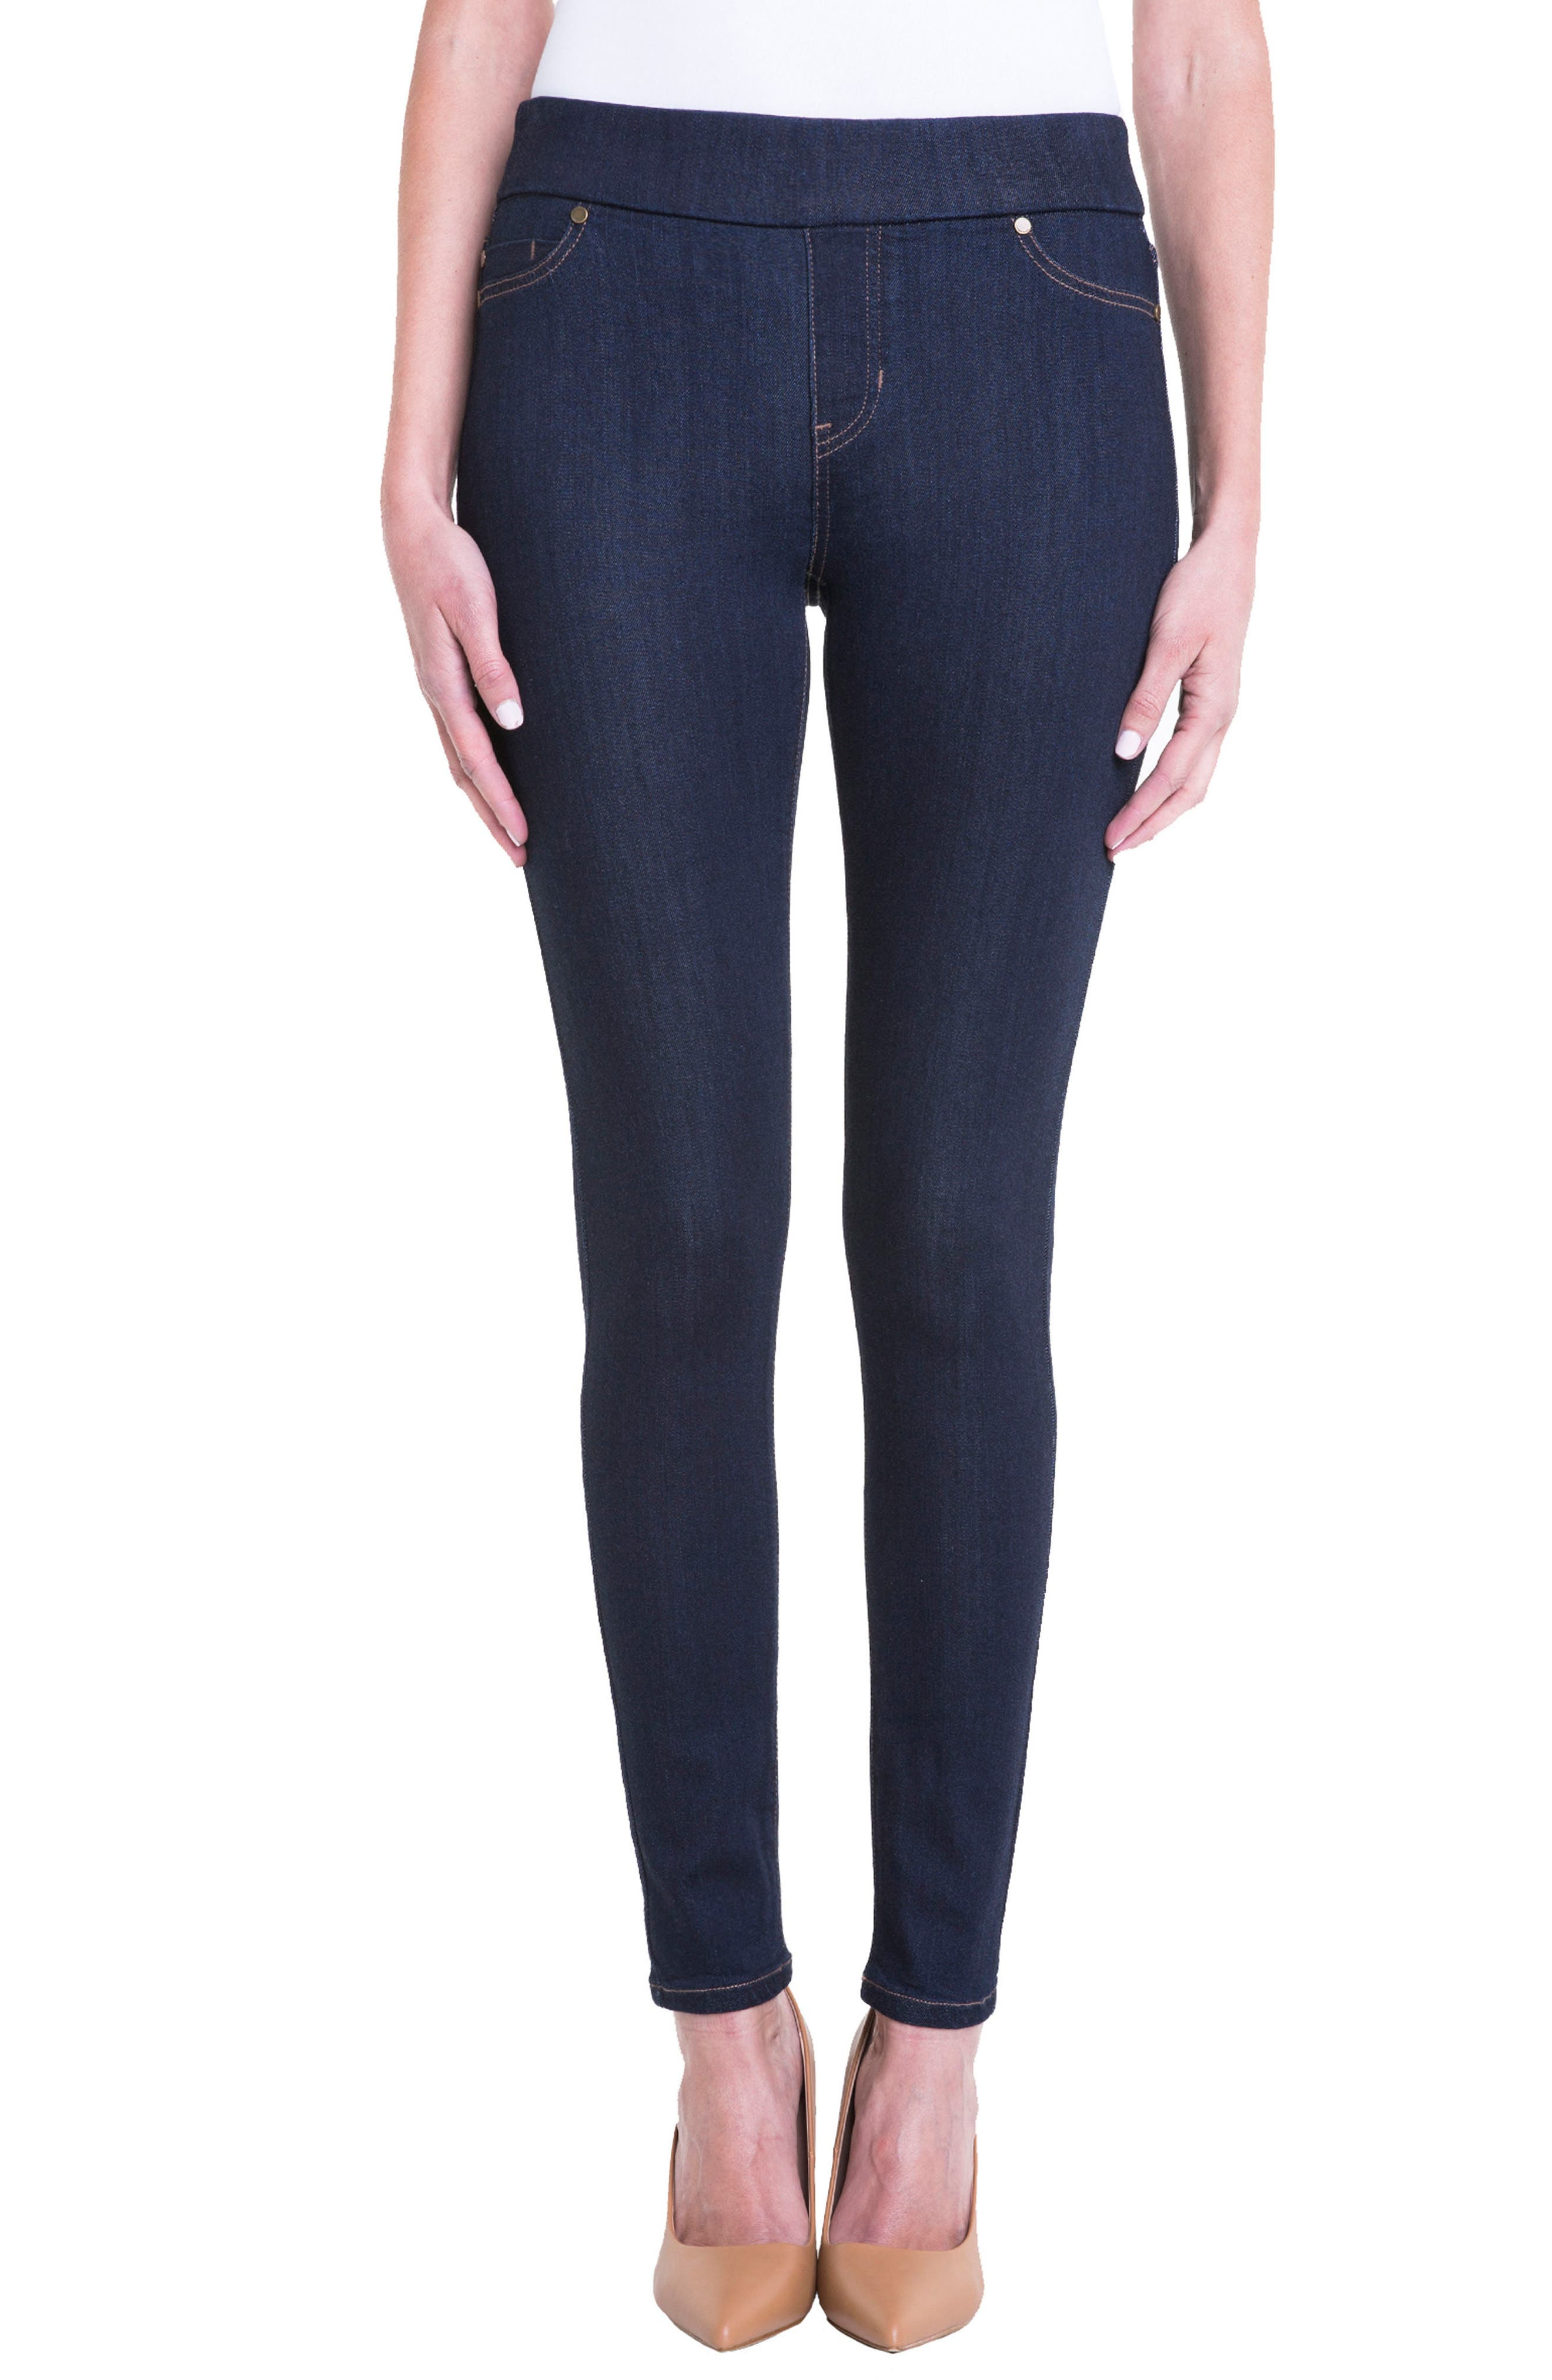 Sienna Mid Rise Soft Stretch Denim Leggings,                         Main,                         color, Indigo Rinse